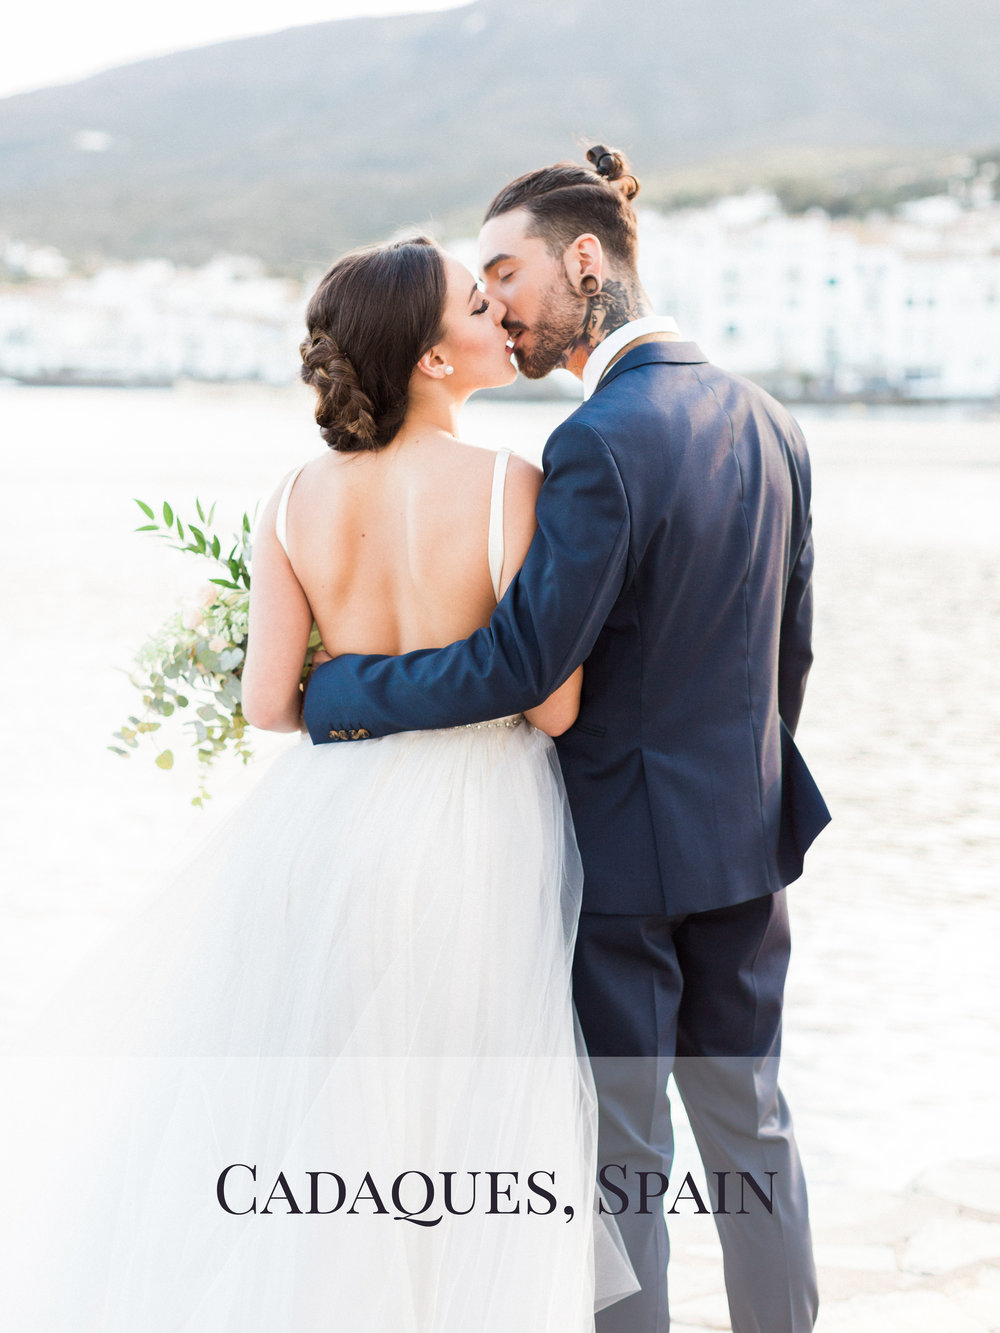 Peaches & Twine Photography Fine Art Film Wedding Destination Photographers Cadaques Spain Intimate Elopement Edwar Tiger Coastal Europe Wedding Photographers